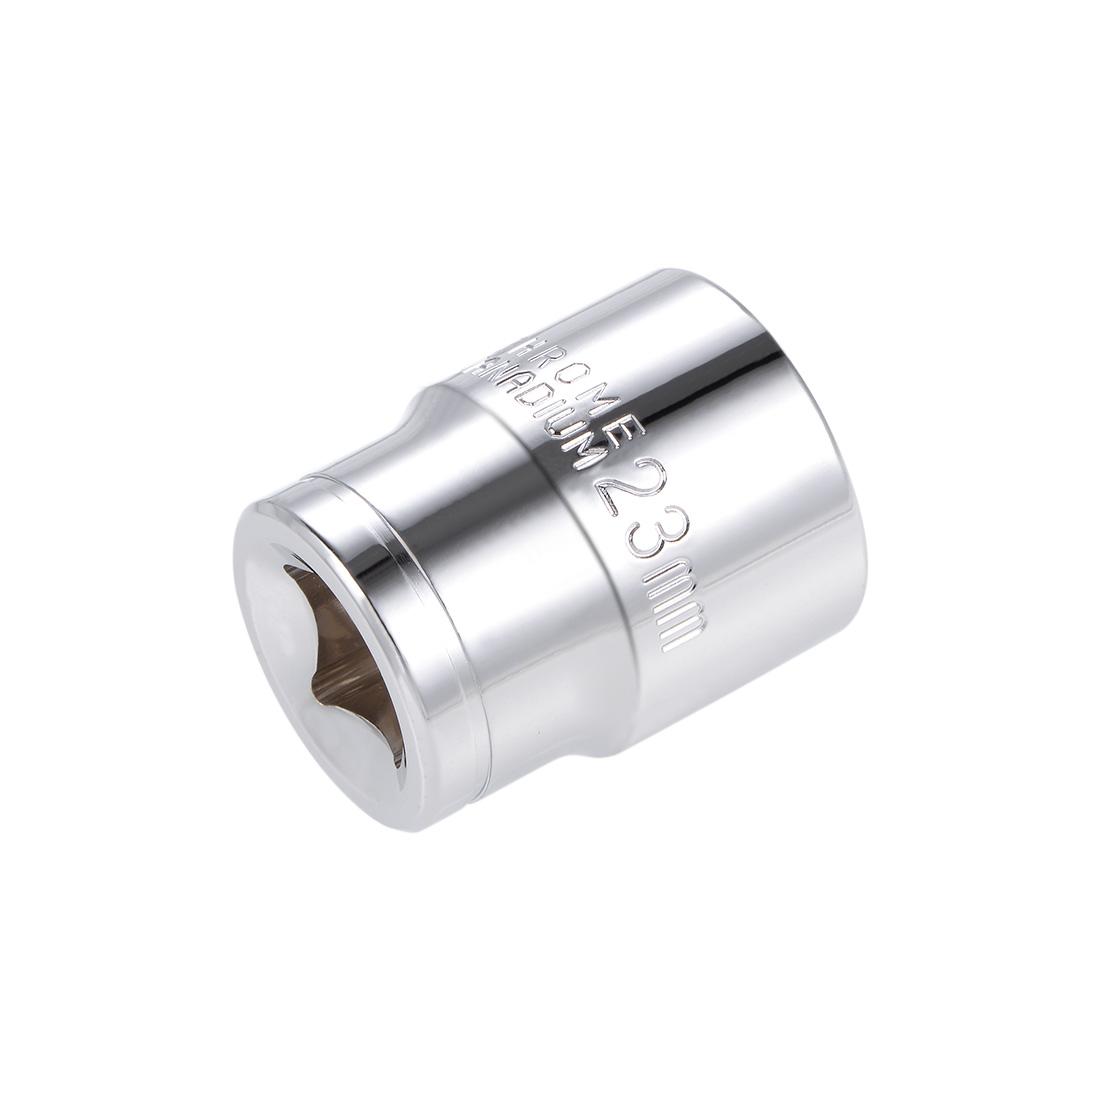 1/2-inch Drive E23 Universal Spline Socket Shallow 12 Point Cr-V Steel